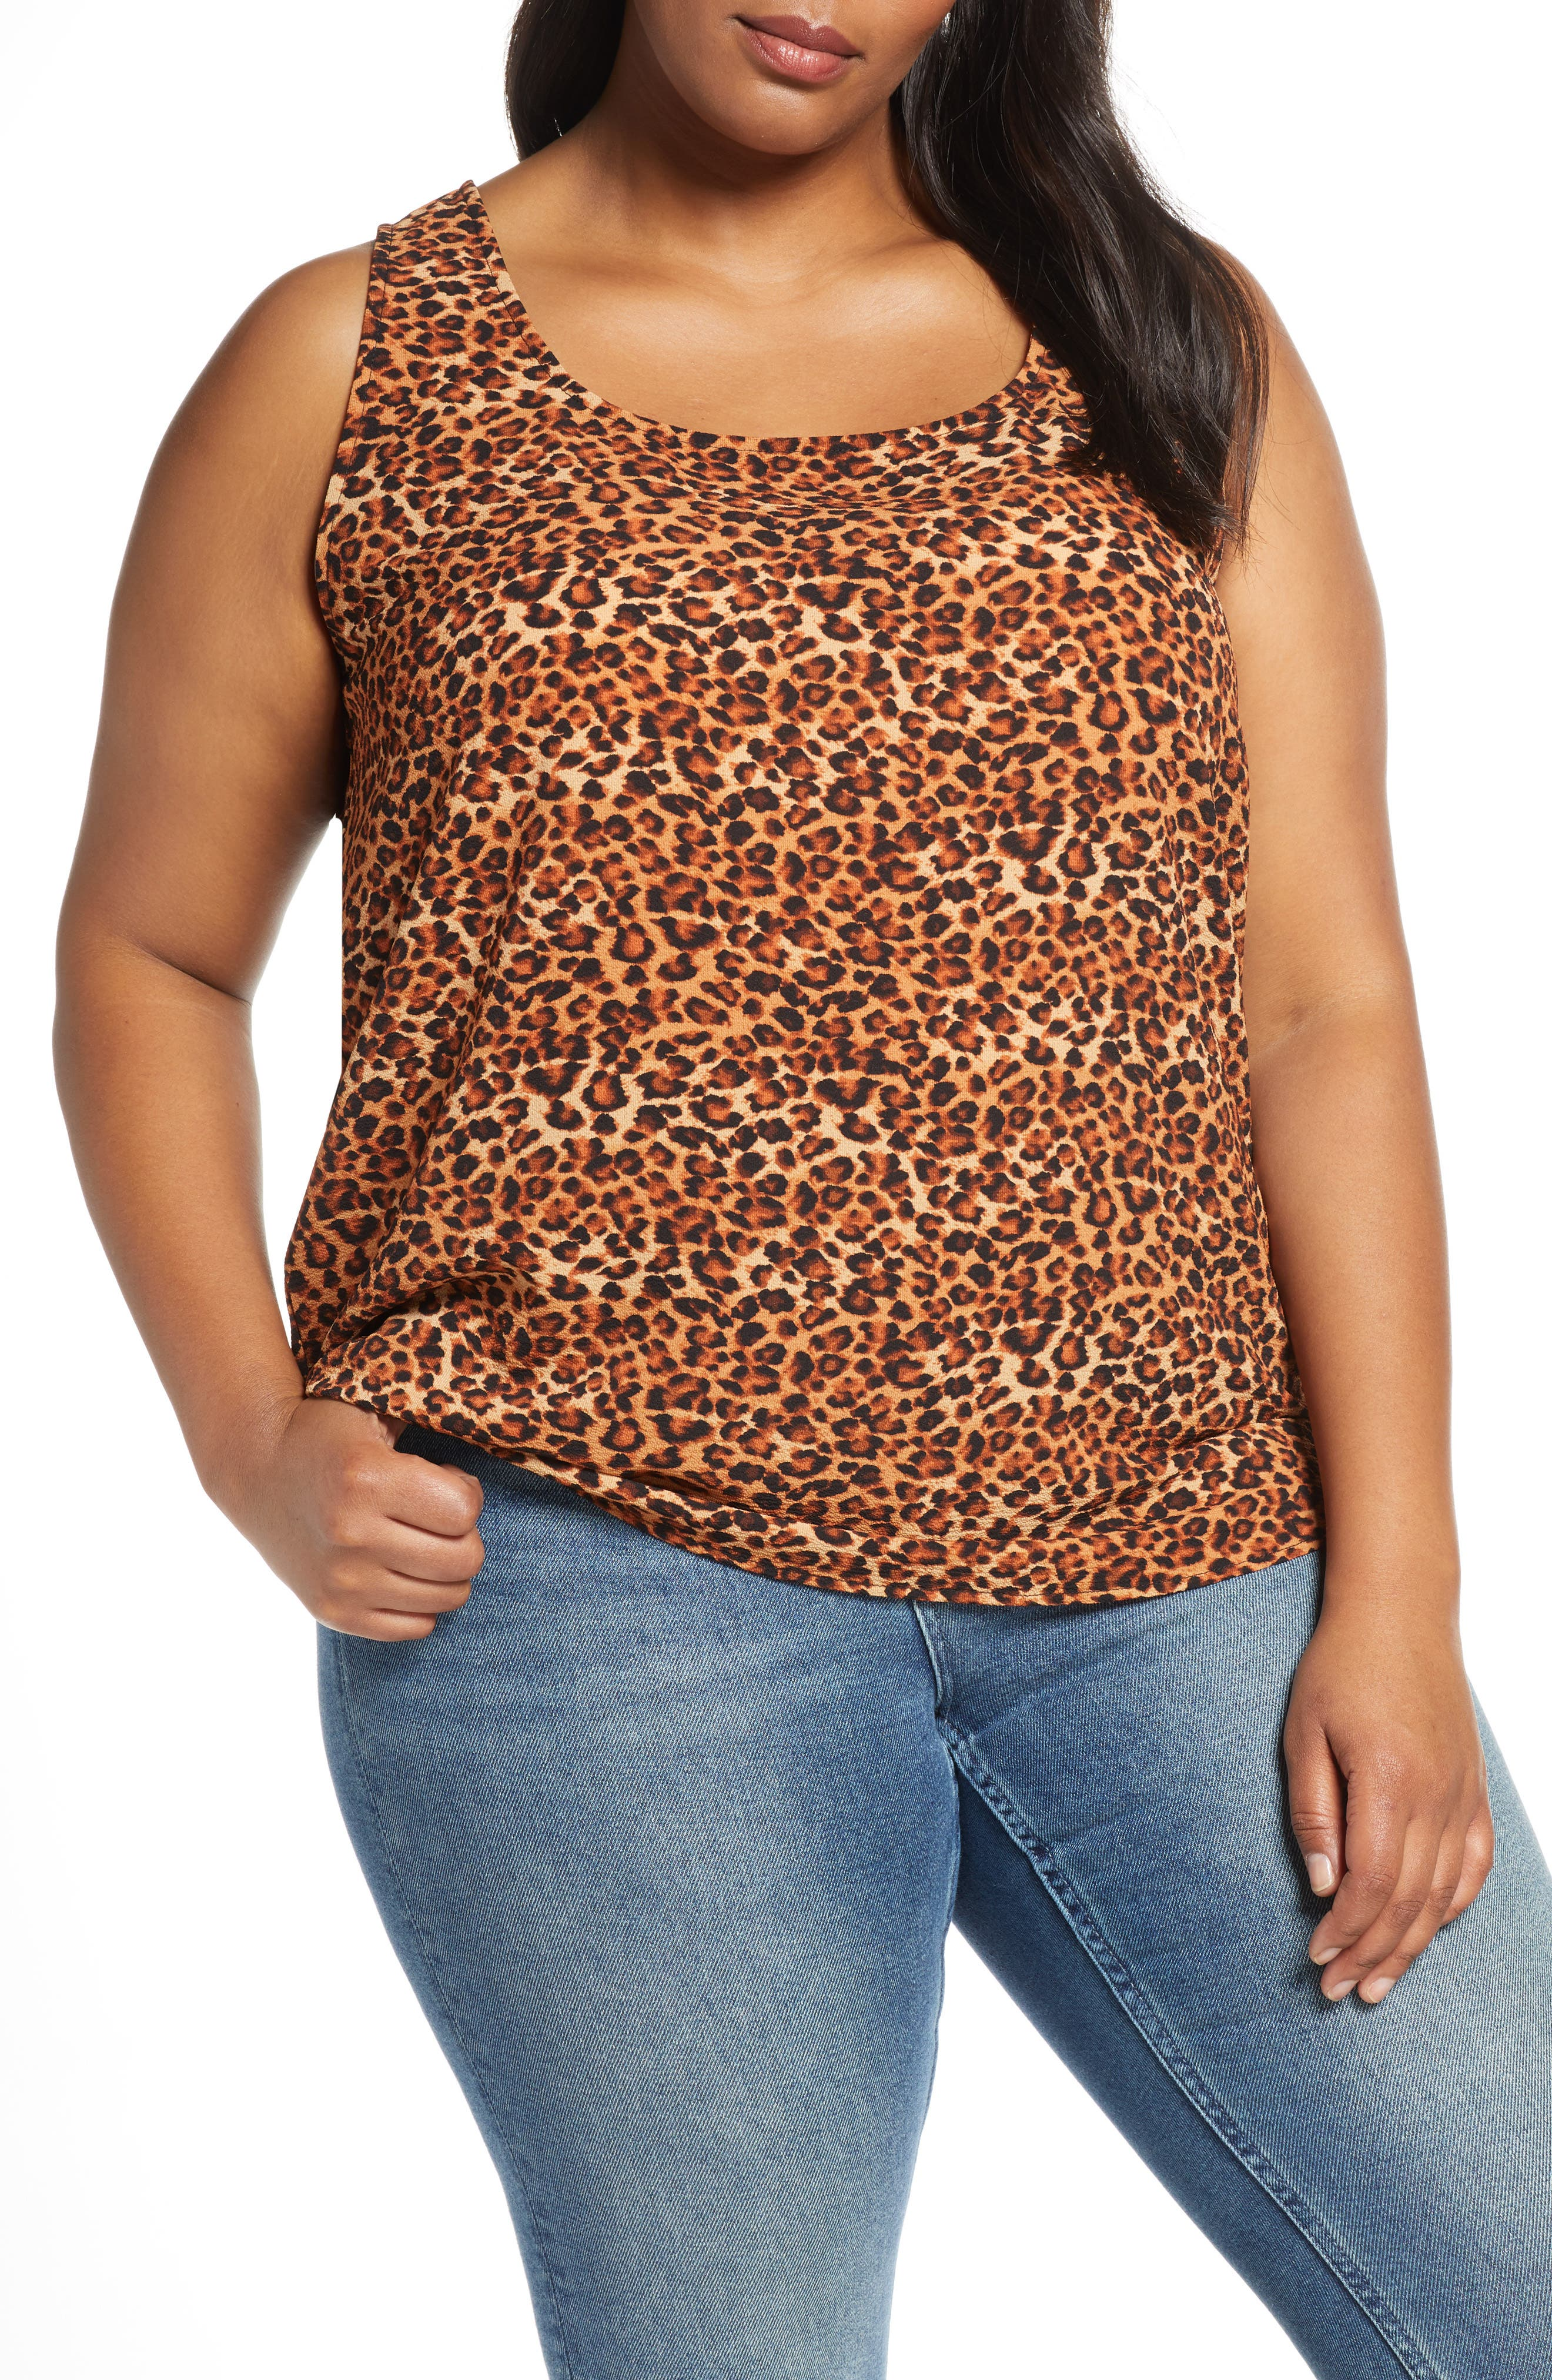 Plus Size Women's Loveapella Easy Scoop Neck Tank Top